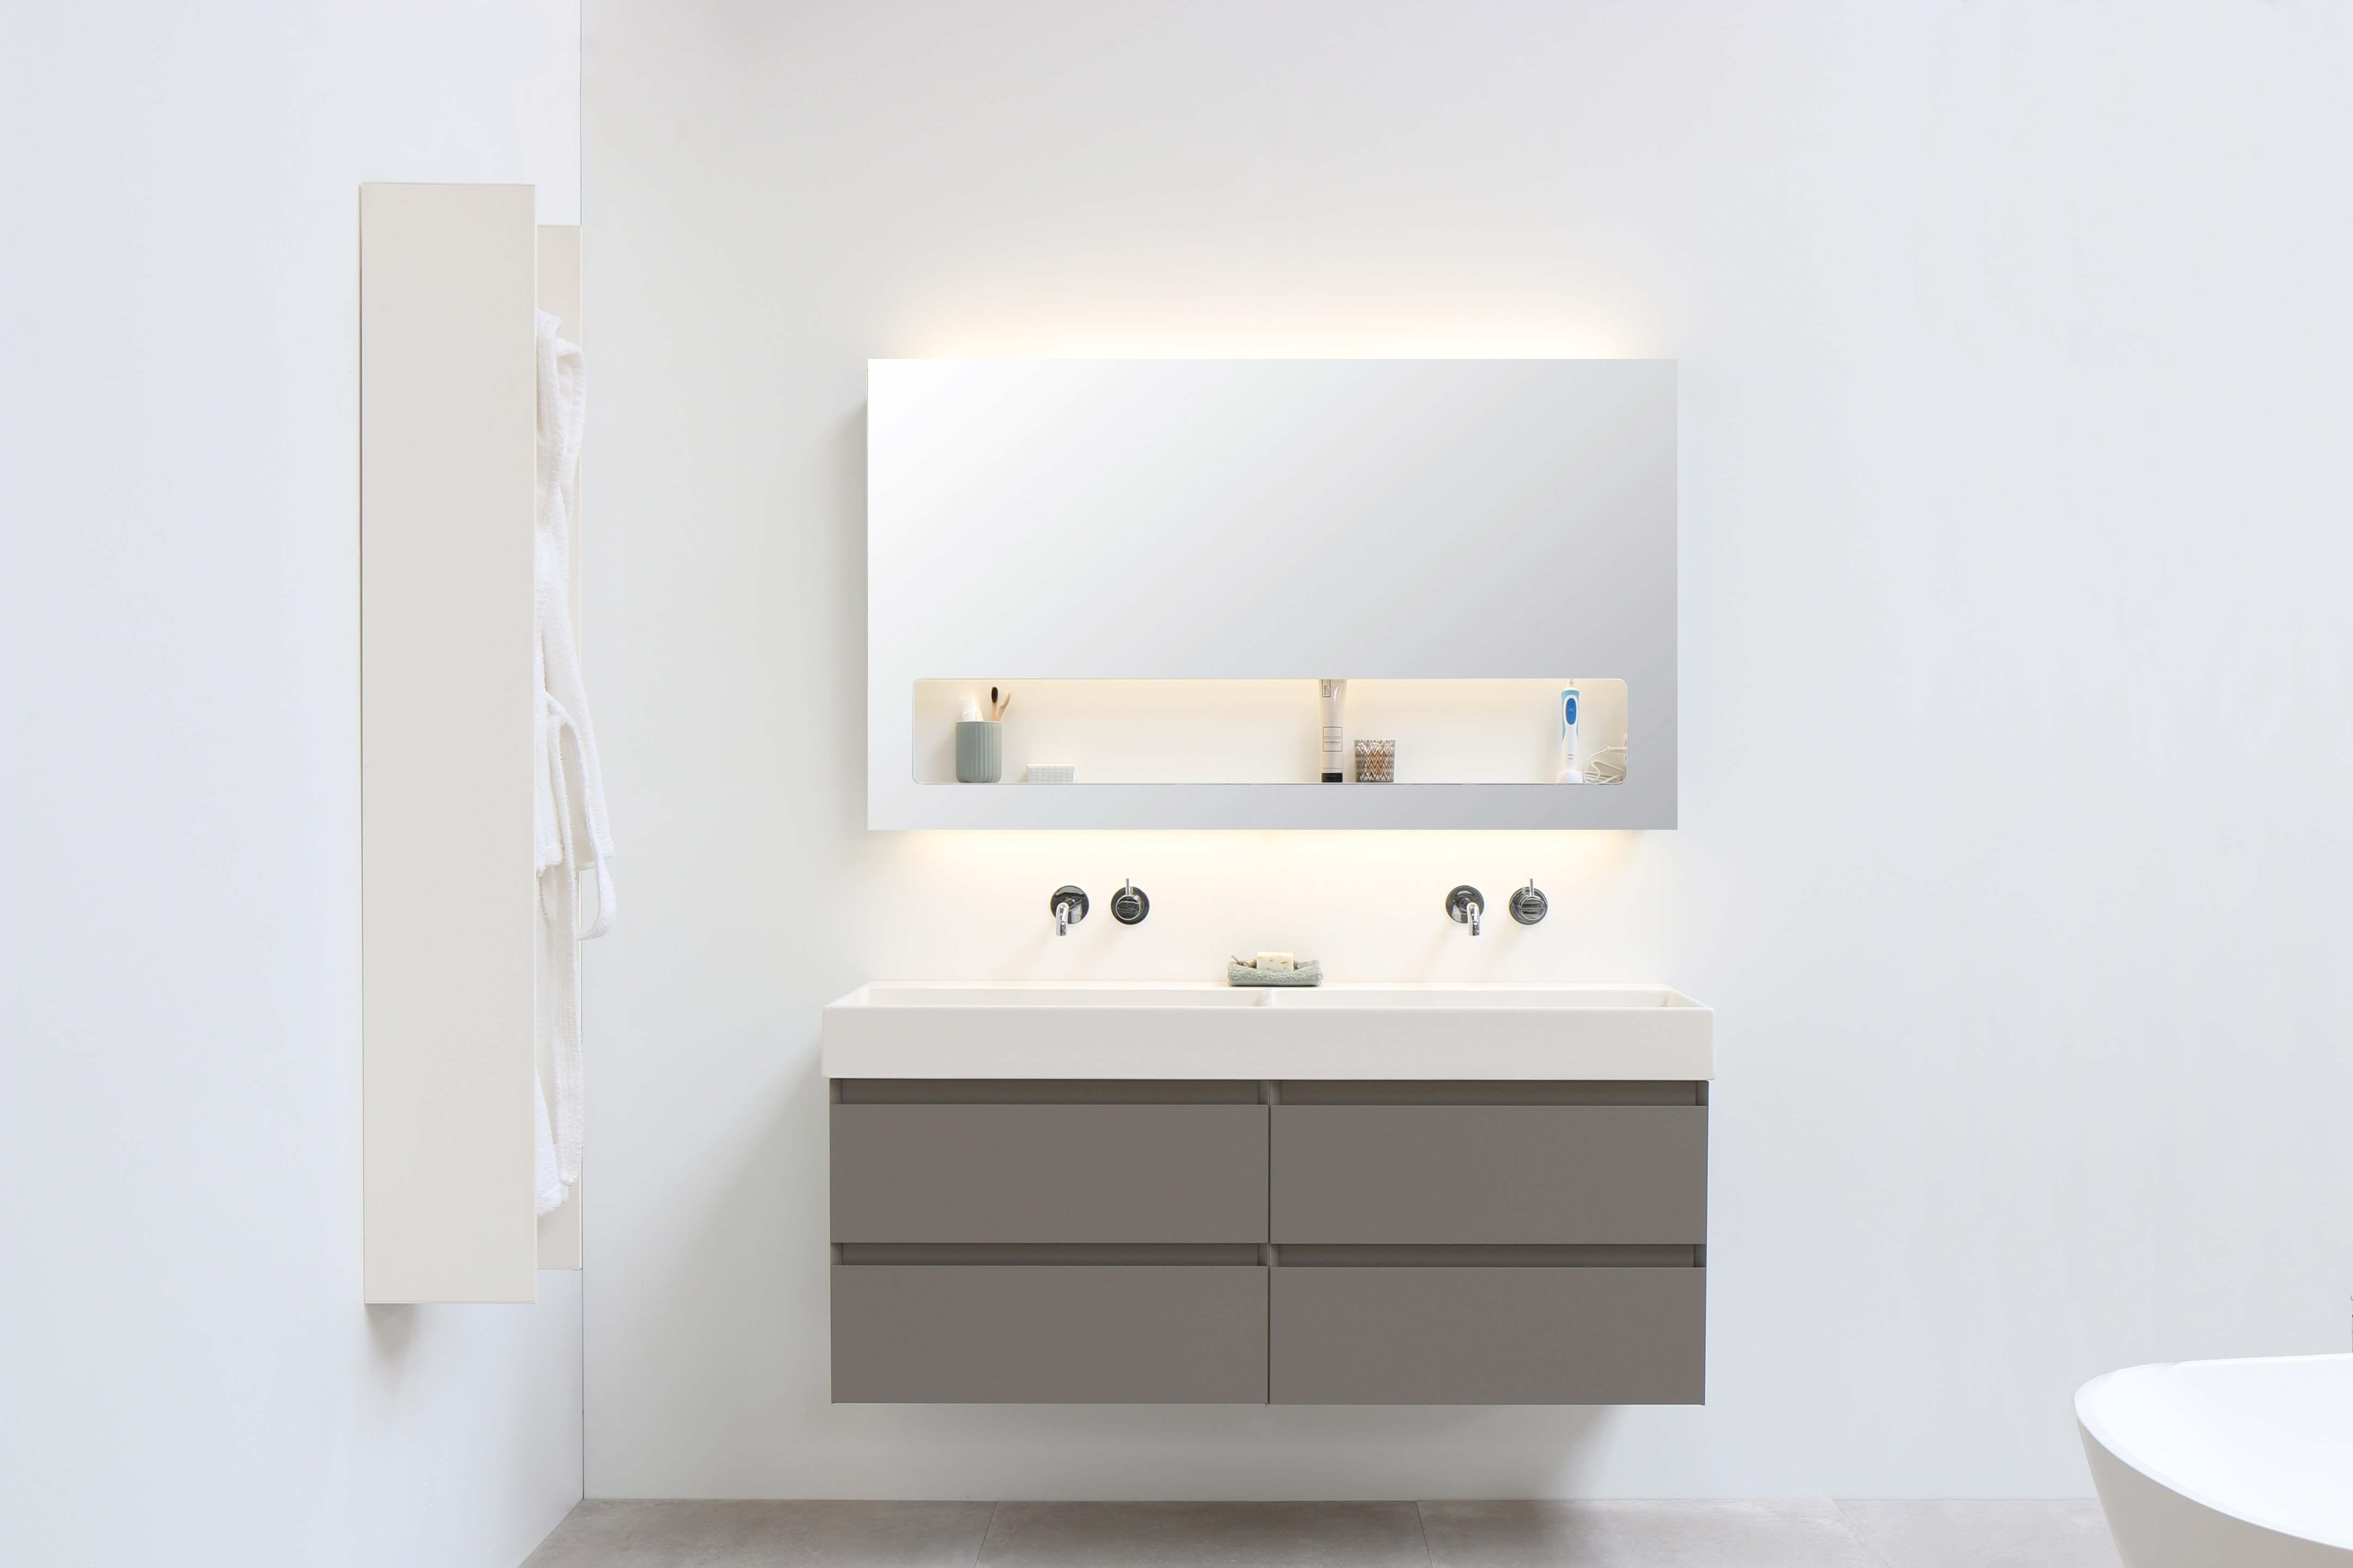 Badkamermeubel met spiegelkast ffdn luxe spiegelkast cm breed